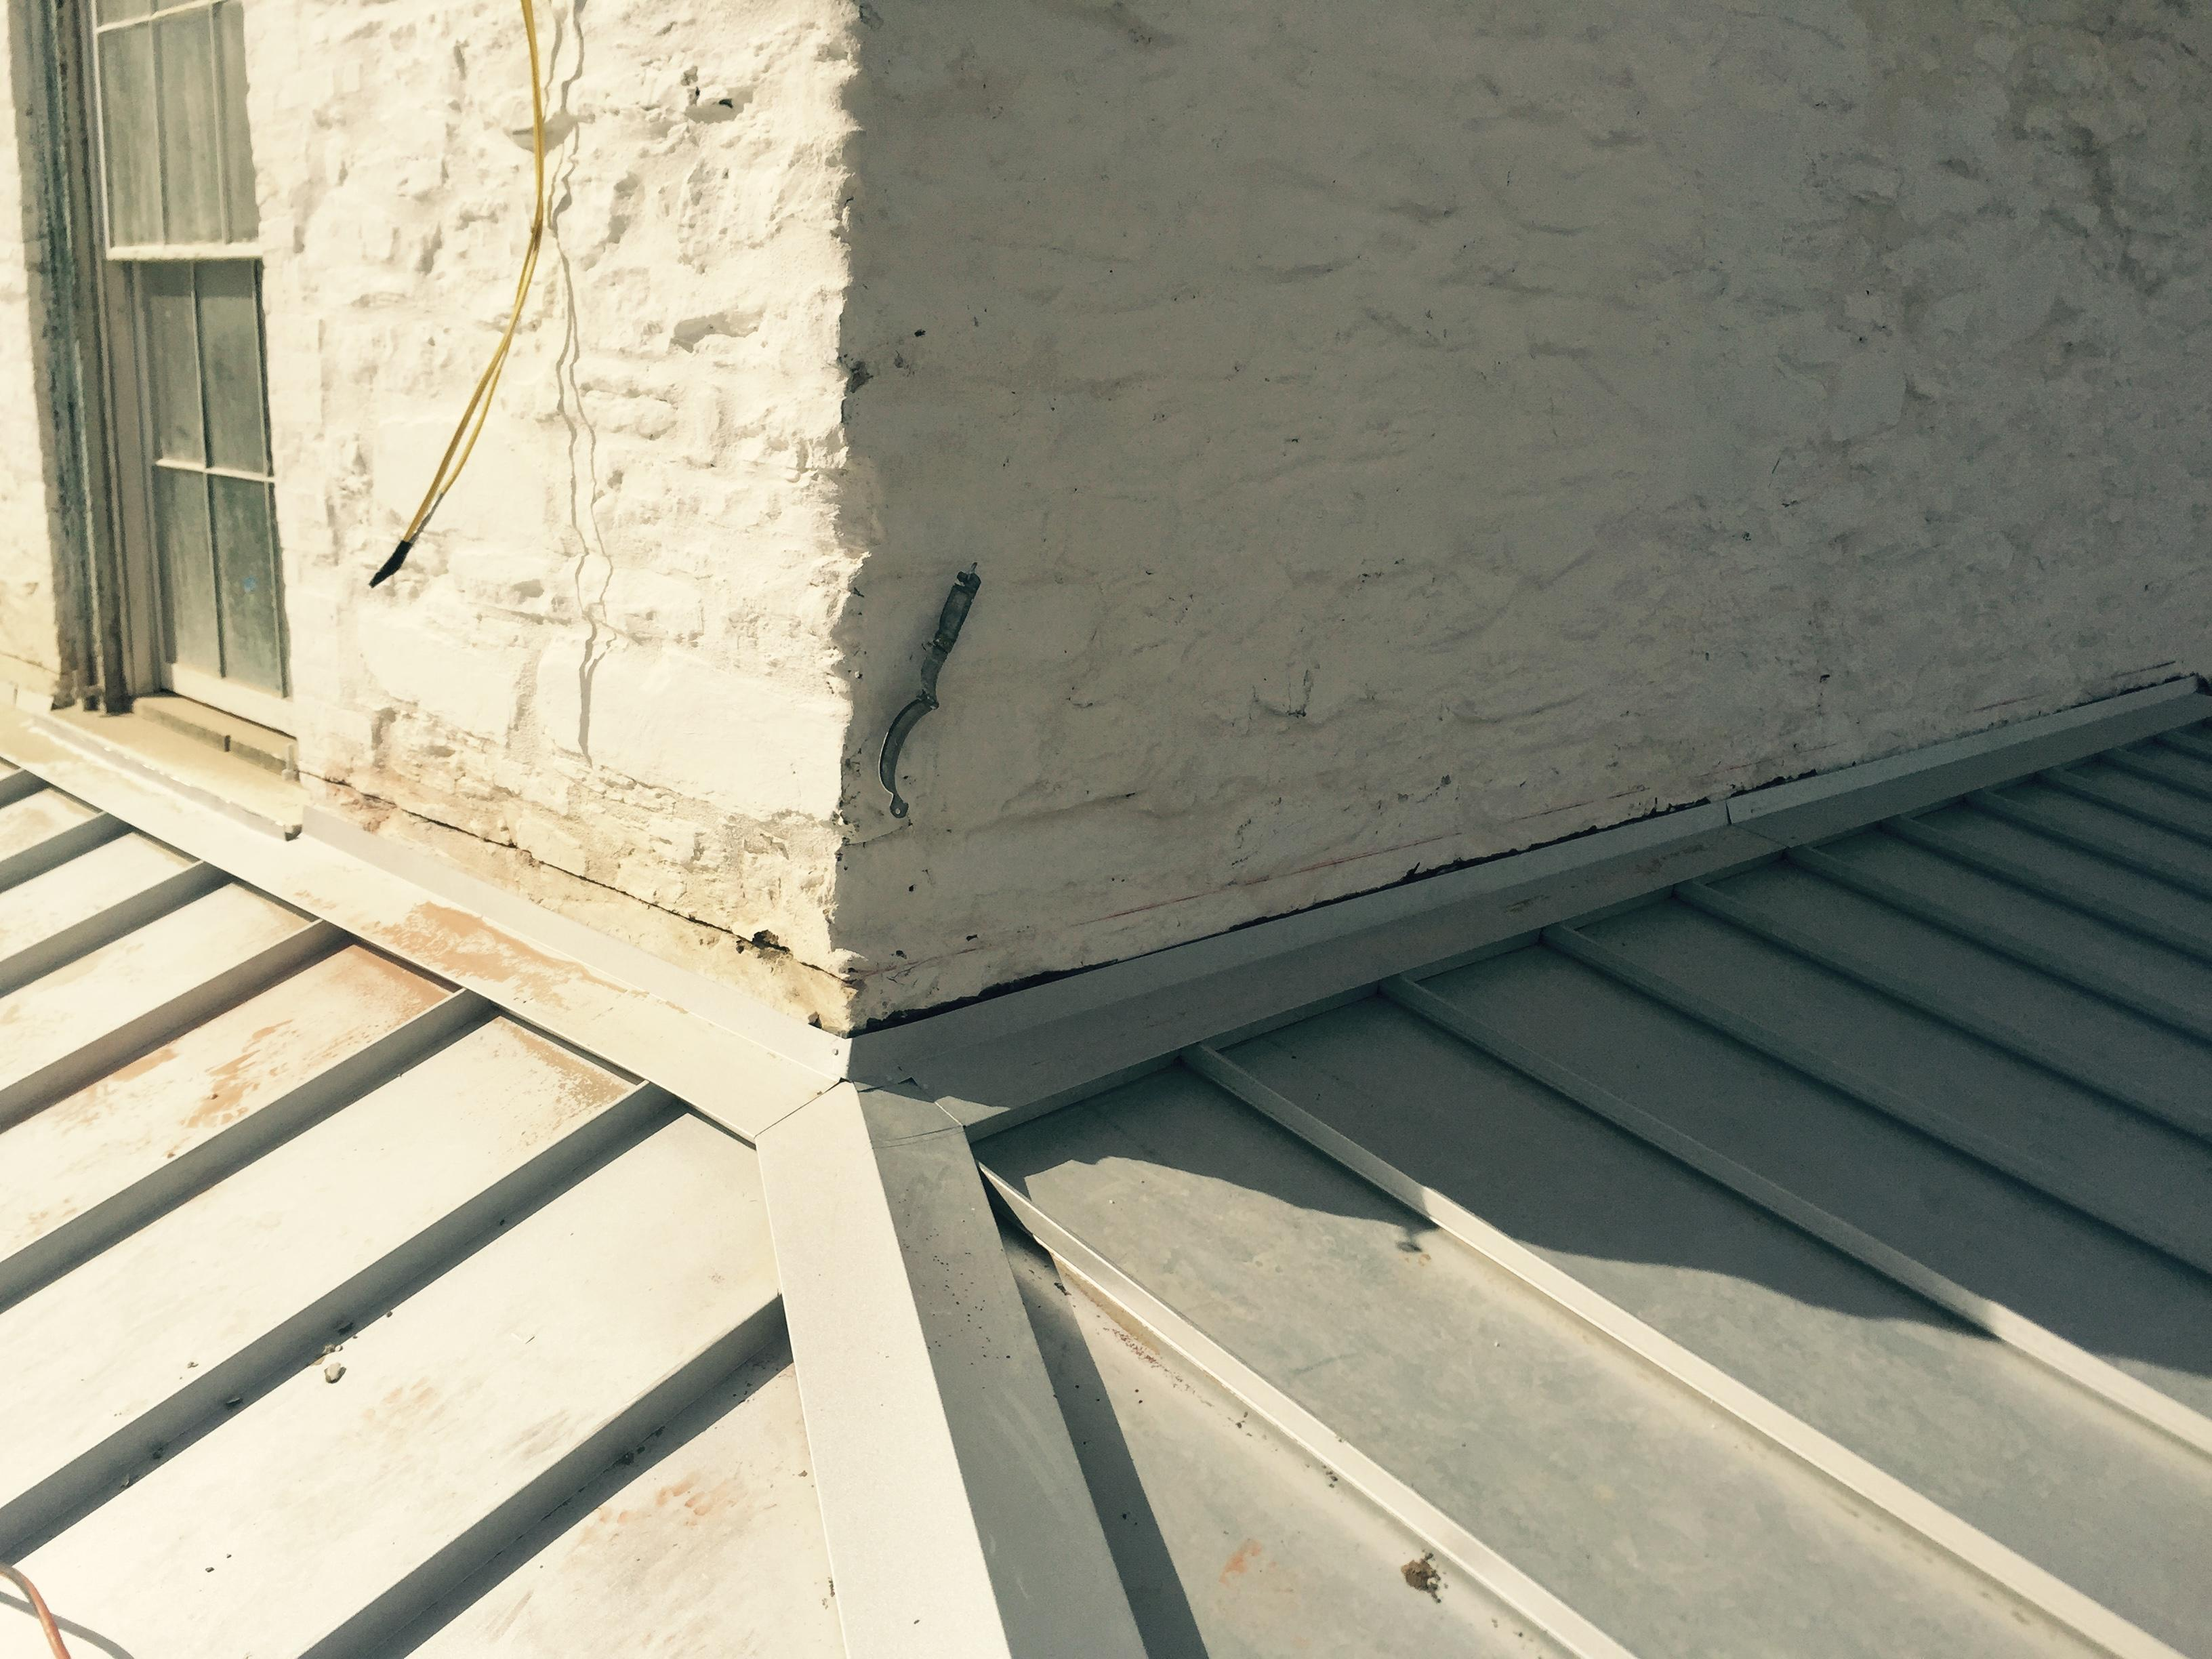 Daniel T. Howell Roofing Company, Inc. image 30